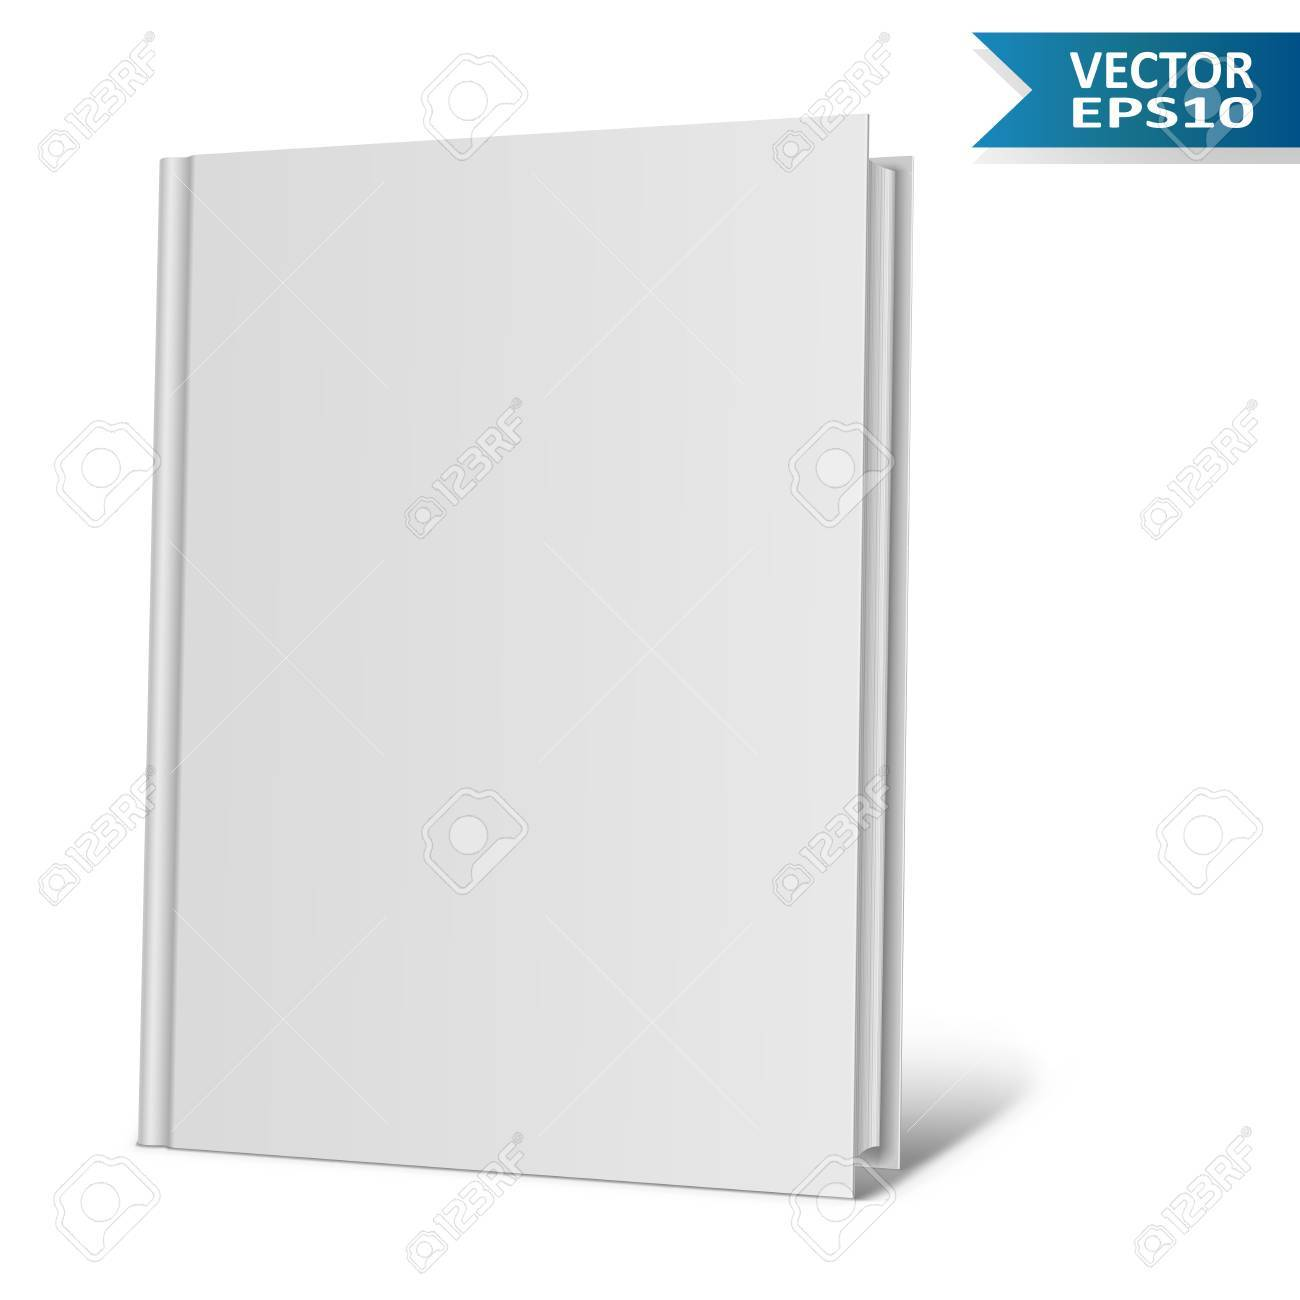 Livre Vierge Isole Illustration Vectorielle Isolee